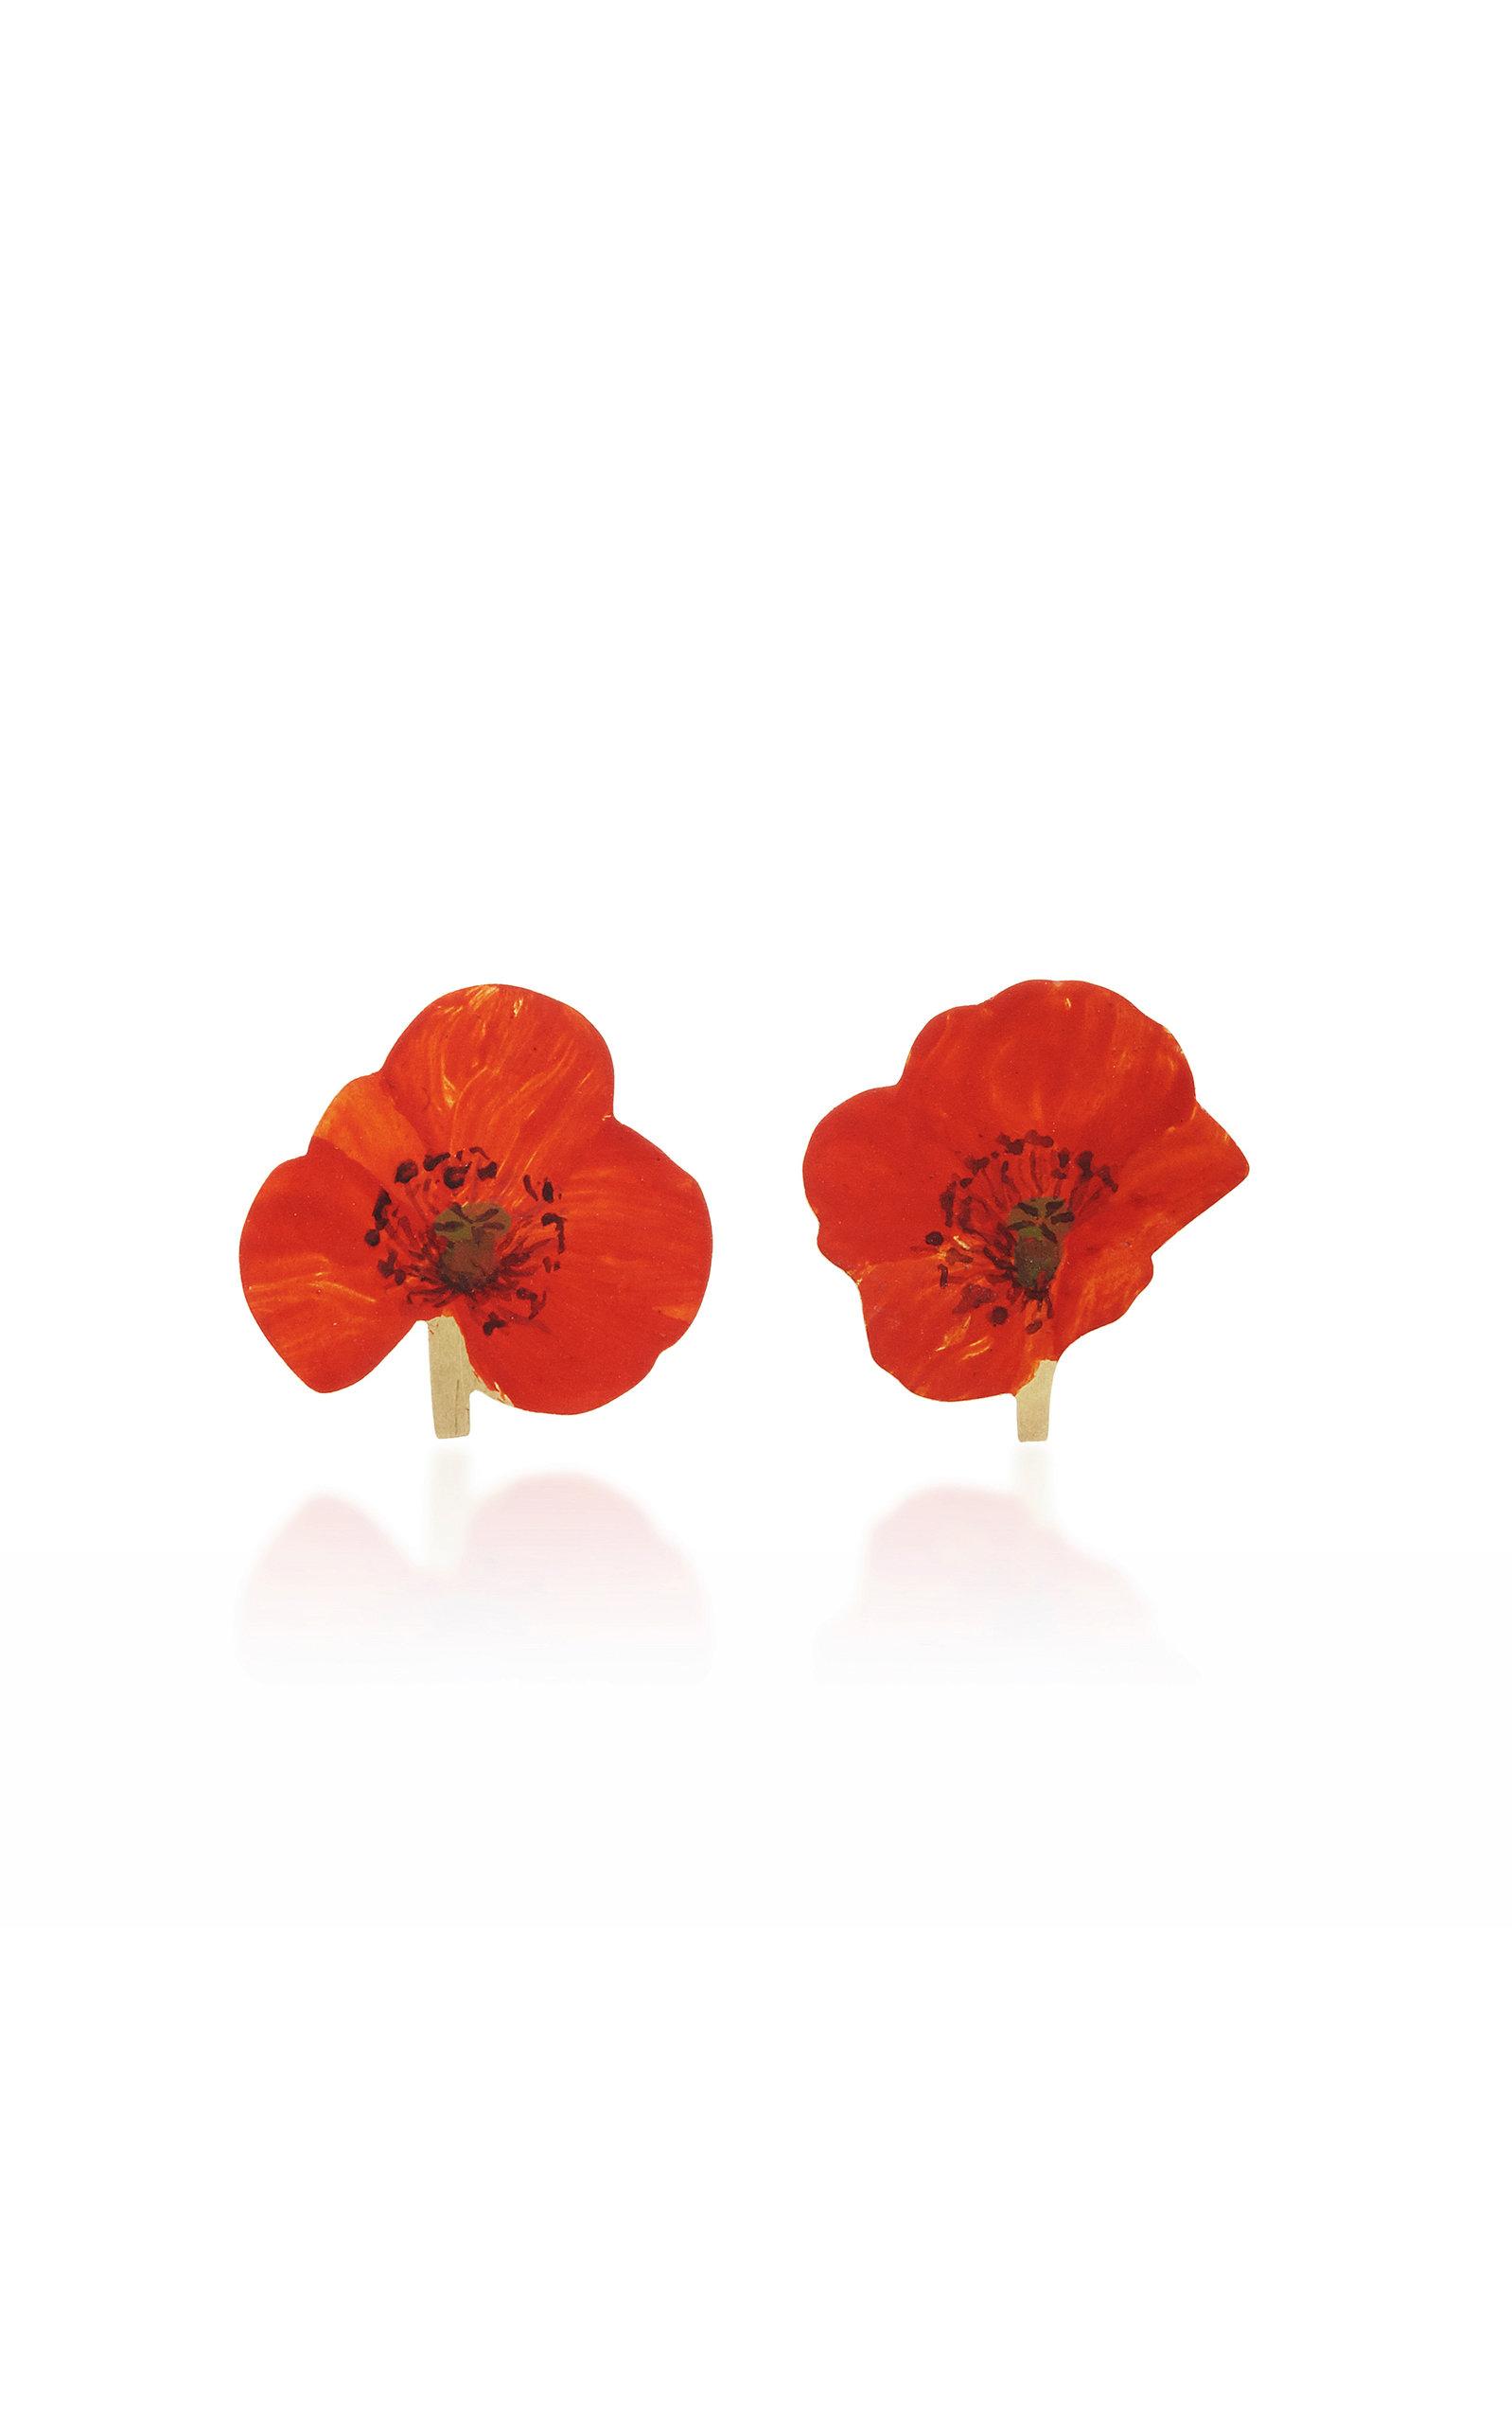 CHRISTOPHER THOMPSON ROYDS Poppy Stud Earrings in Red